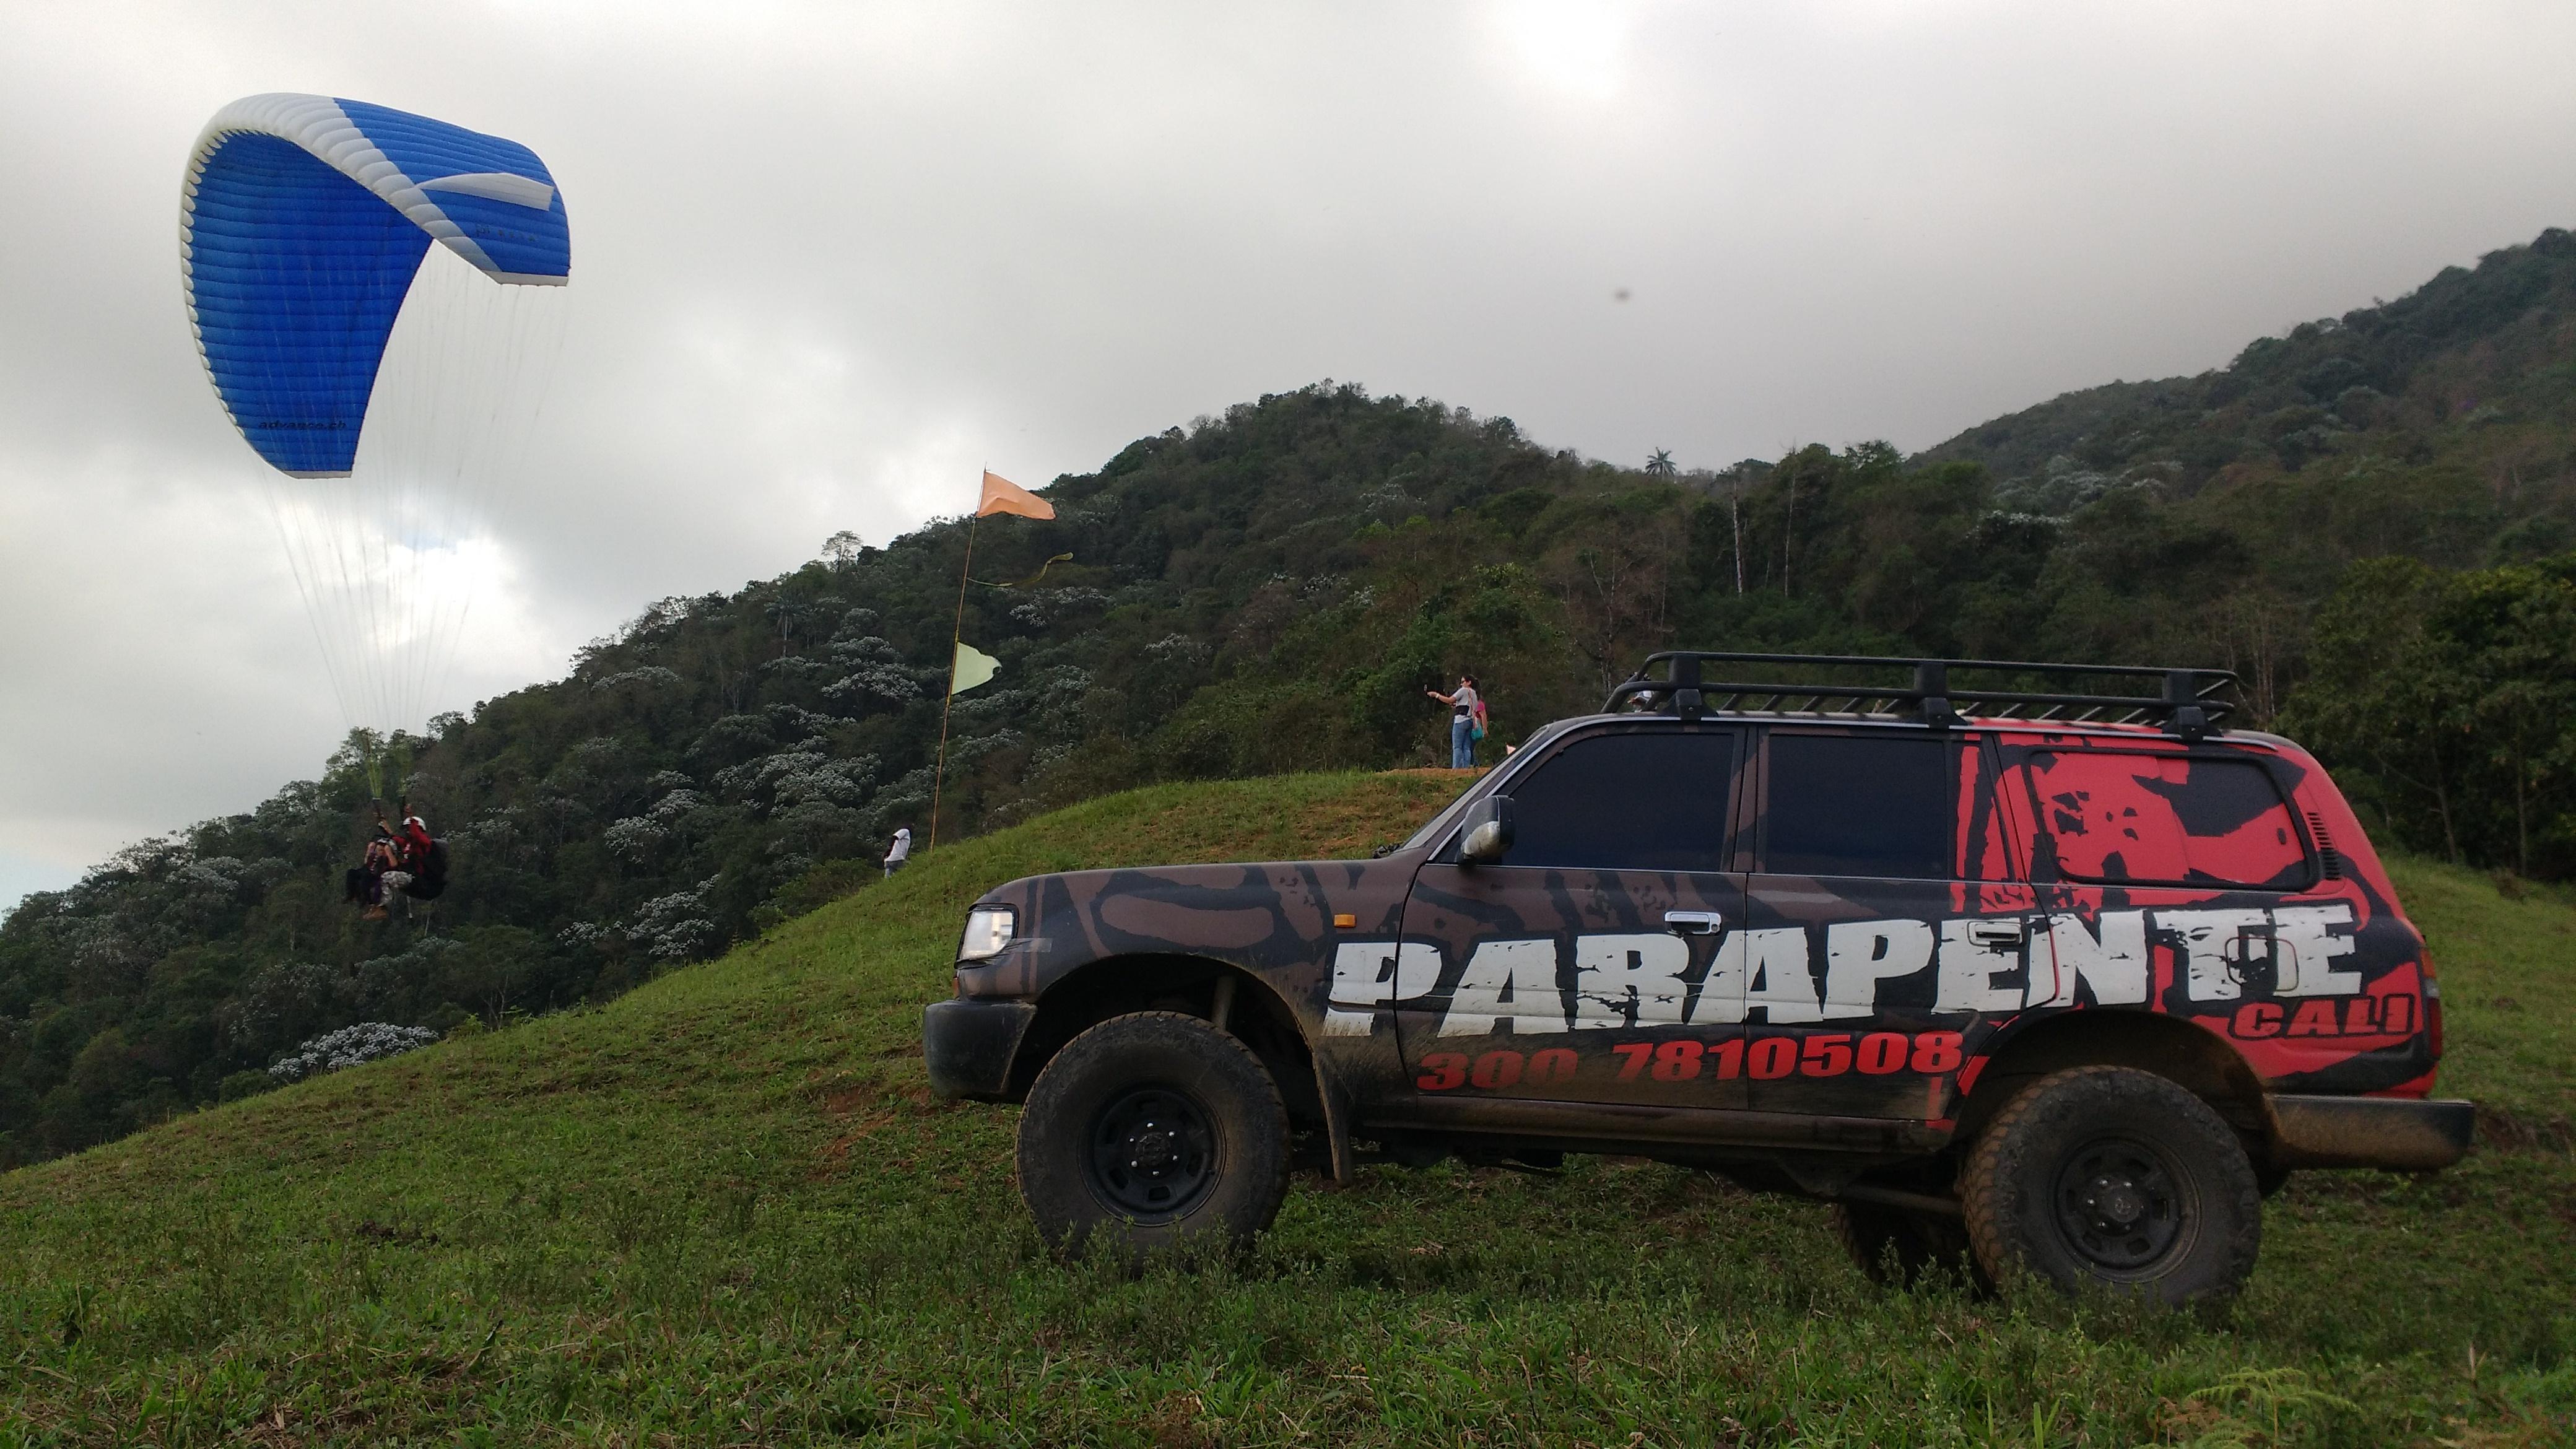 #Yovueloconparapentecali